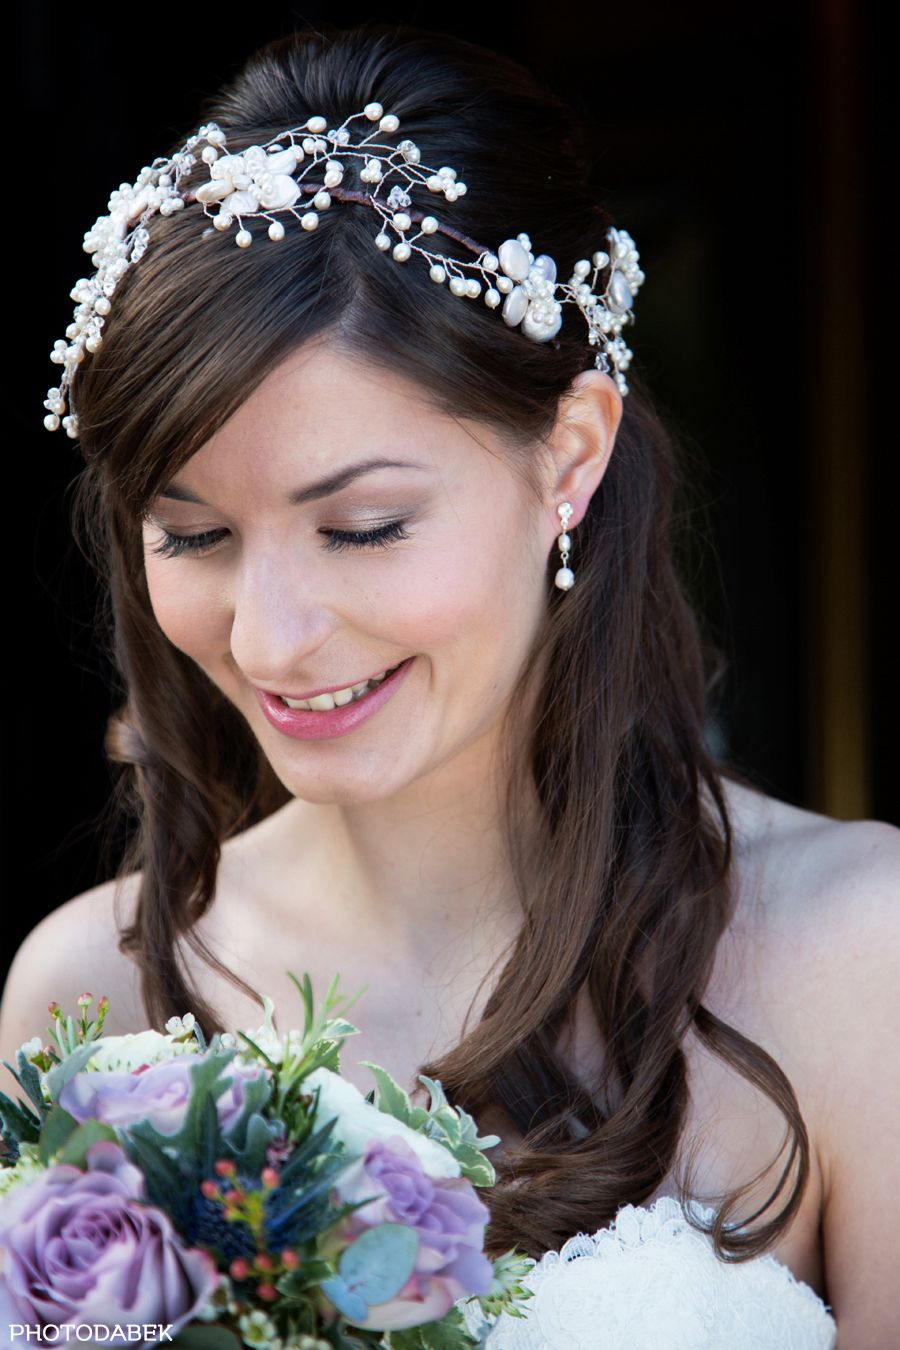 Bridal Wedding Natural Makeup with Airbrush Foundation